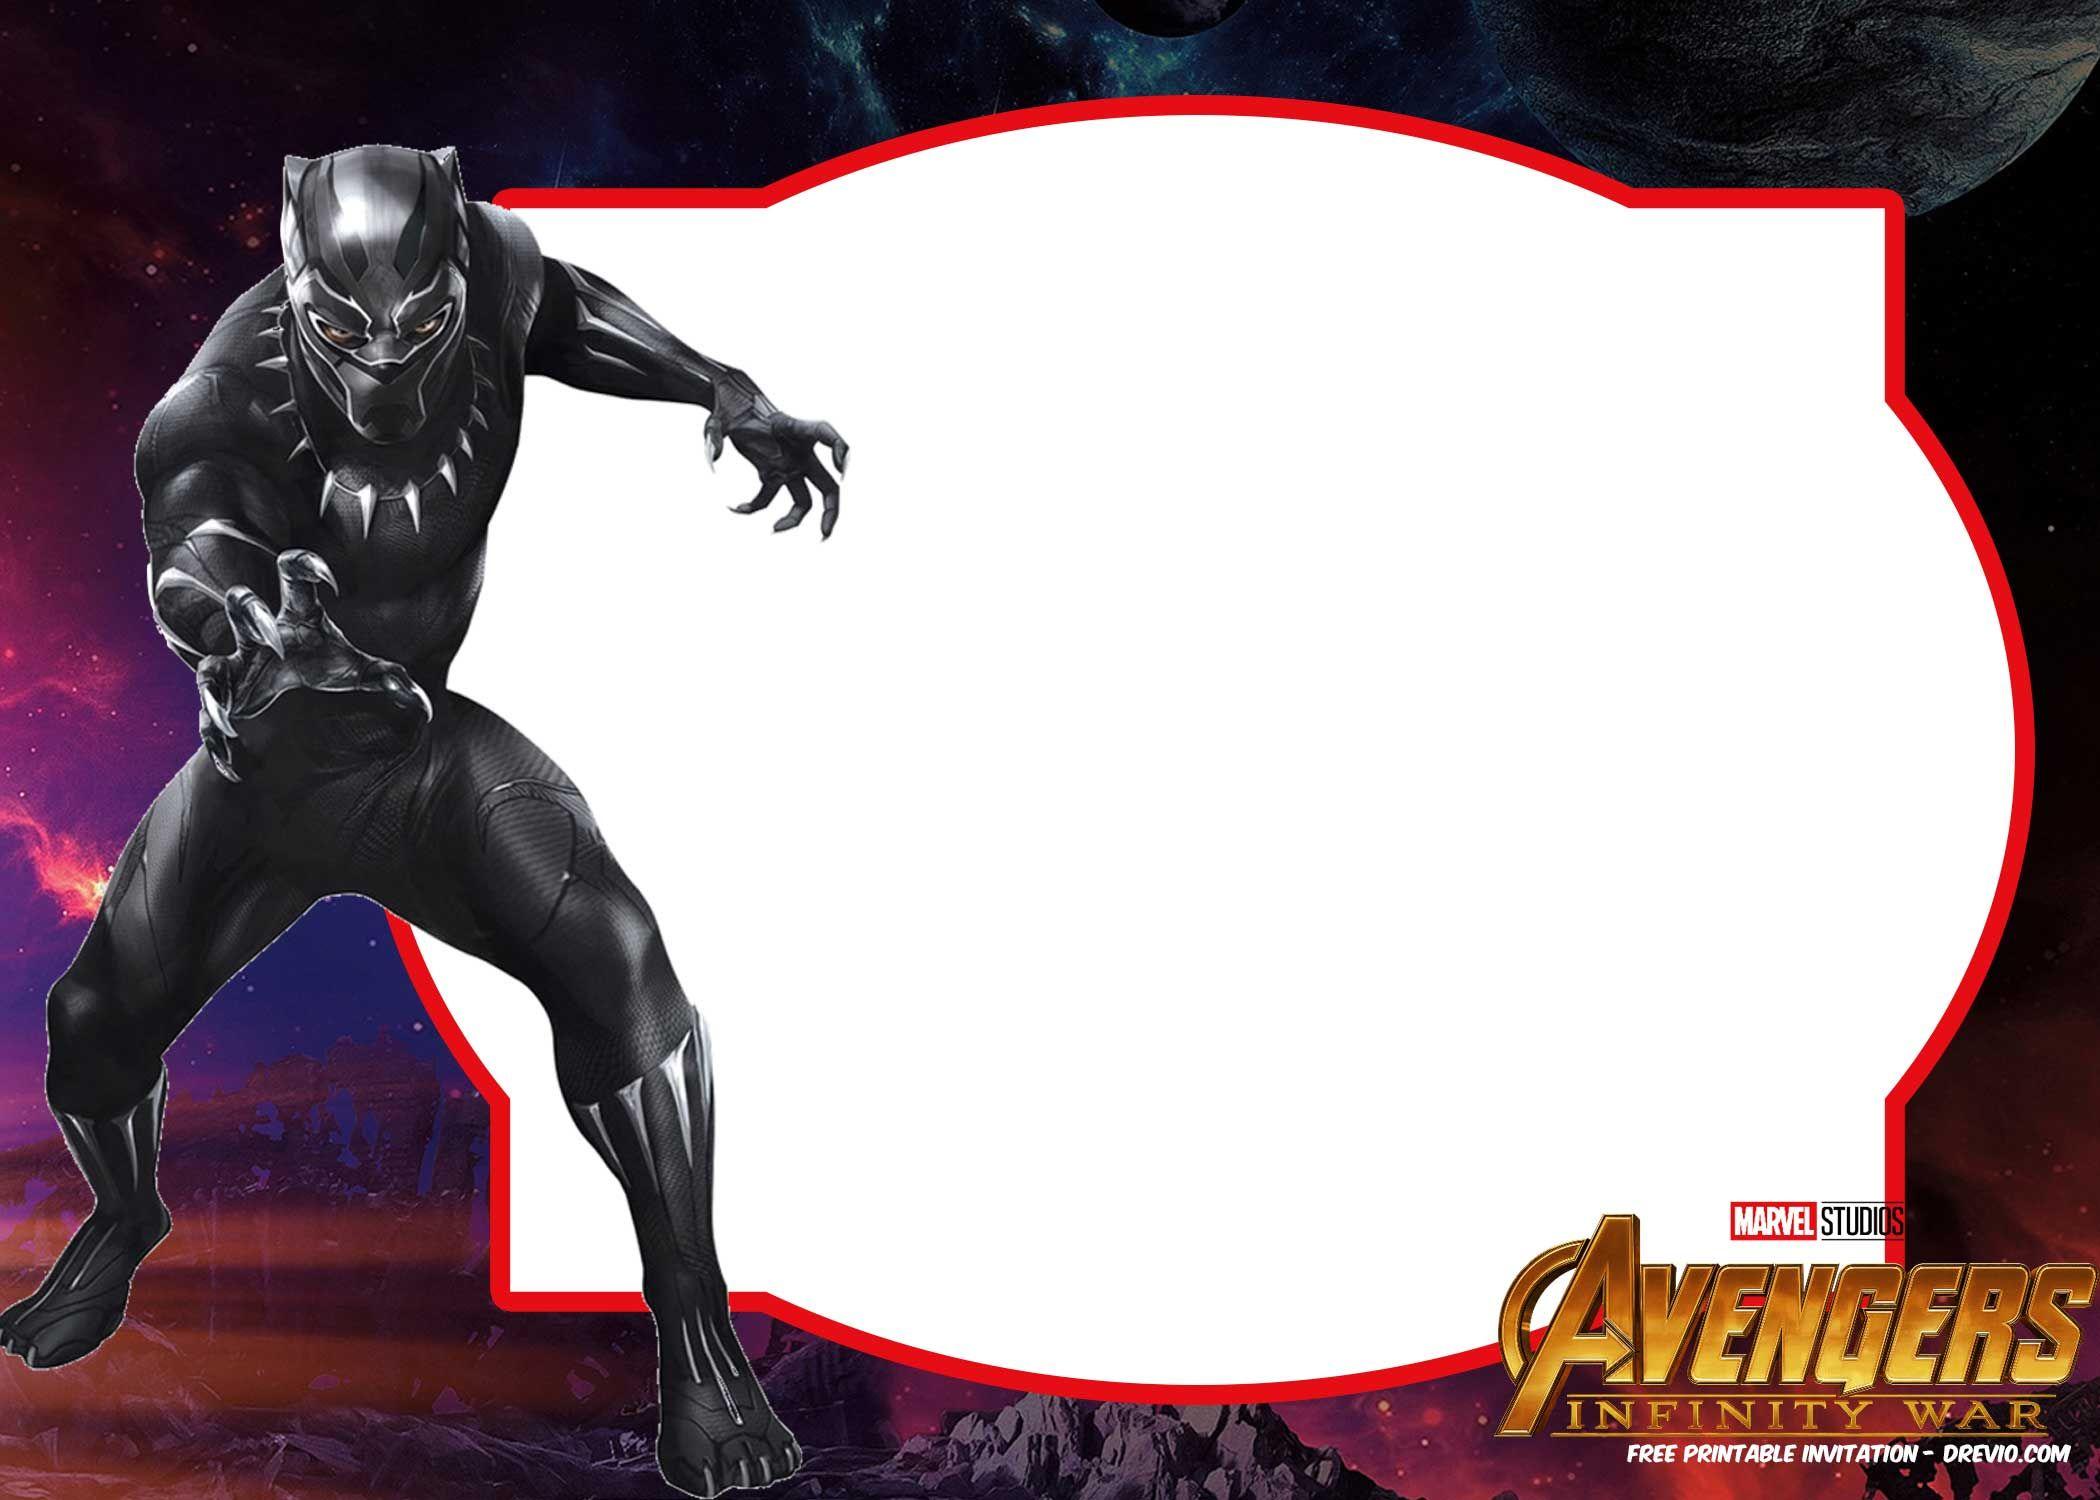 Free Avengers Infinity Wars Birthday Invitation Templates